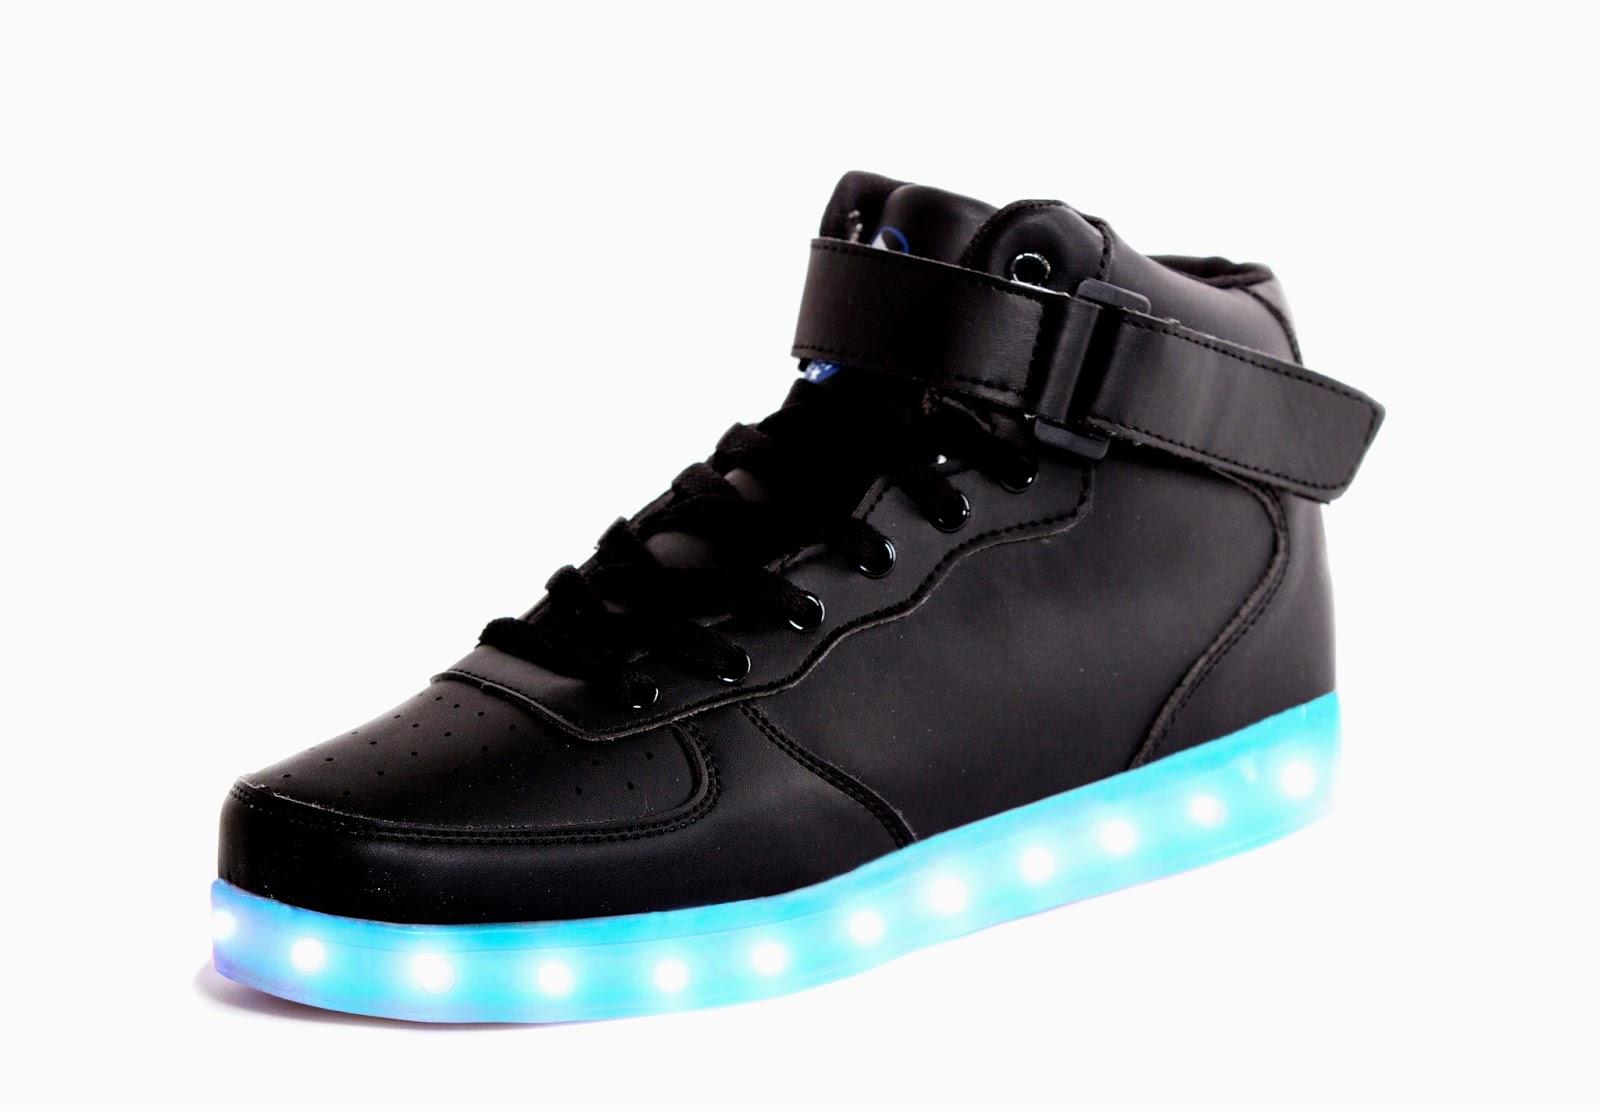 chaussures 2 StyleDAME SKARLETTE à Swag Les LED 7fgv6YbyIm